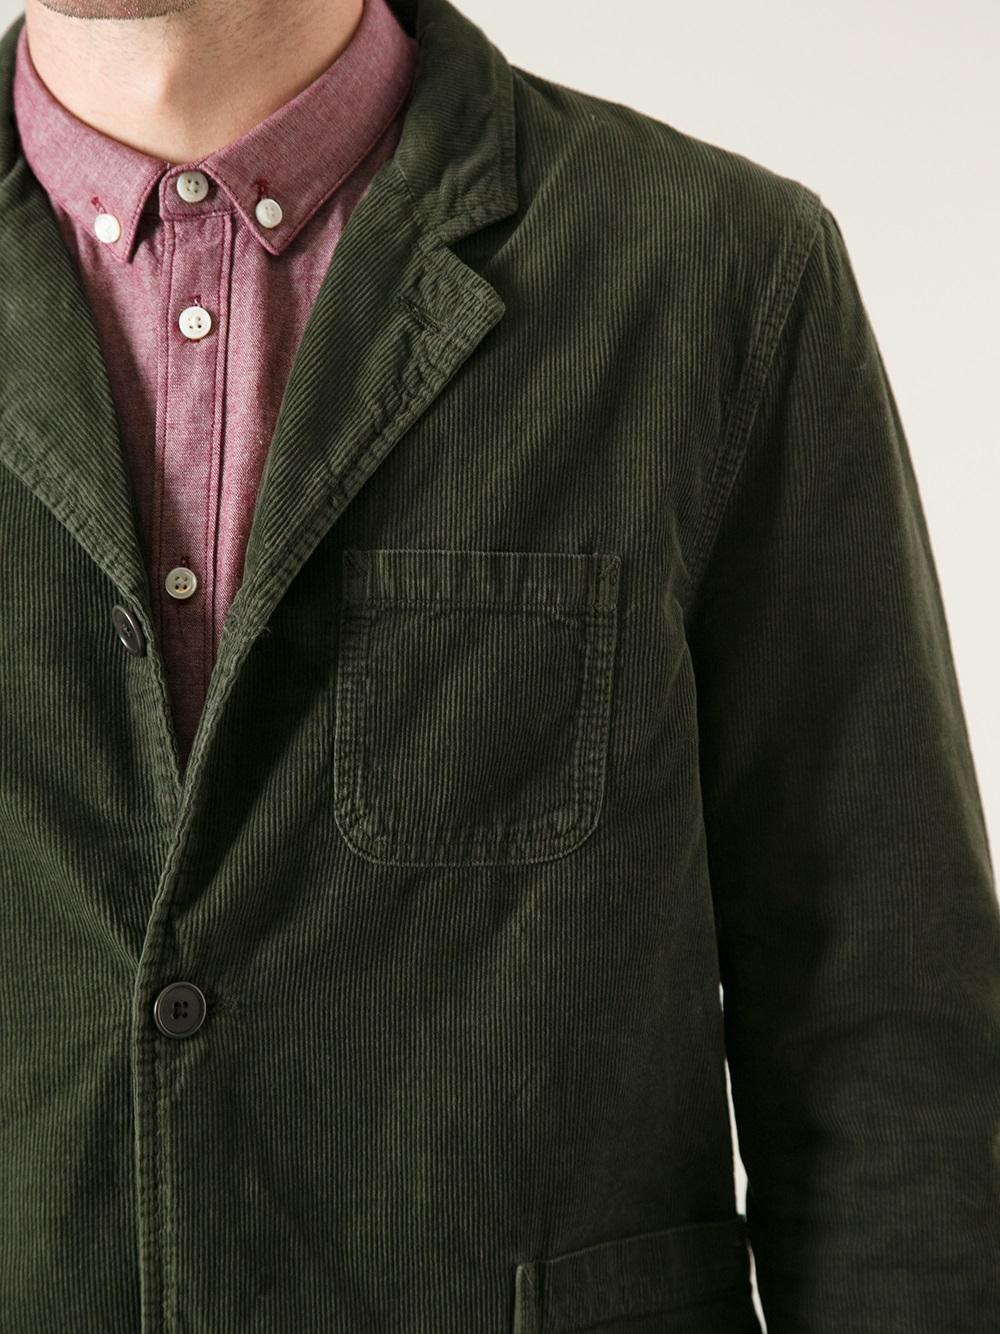 Edwin Three Button Corduroy Blazer In Green For Men Lyst